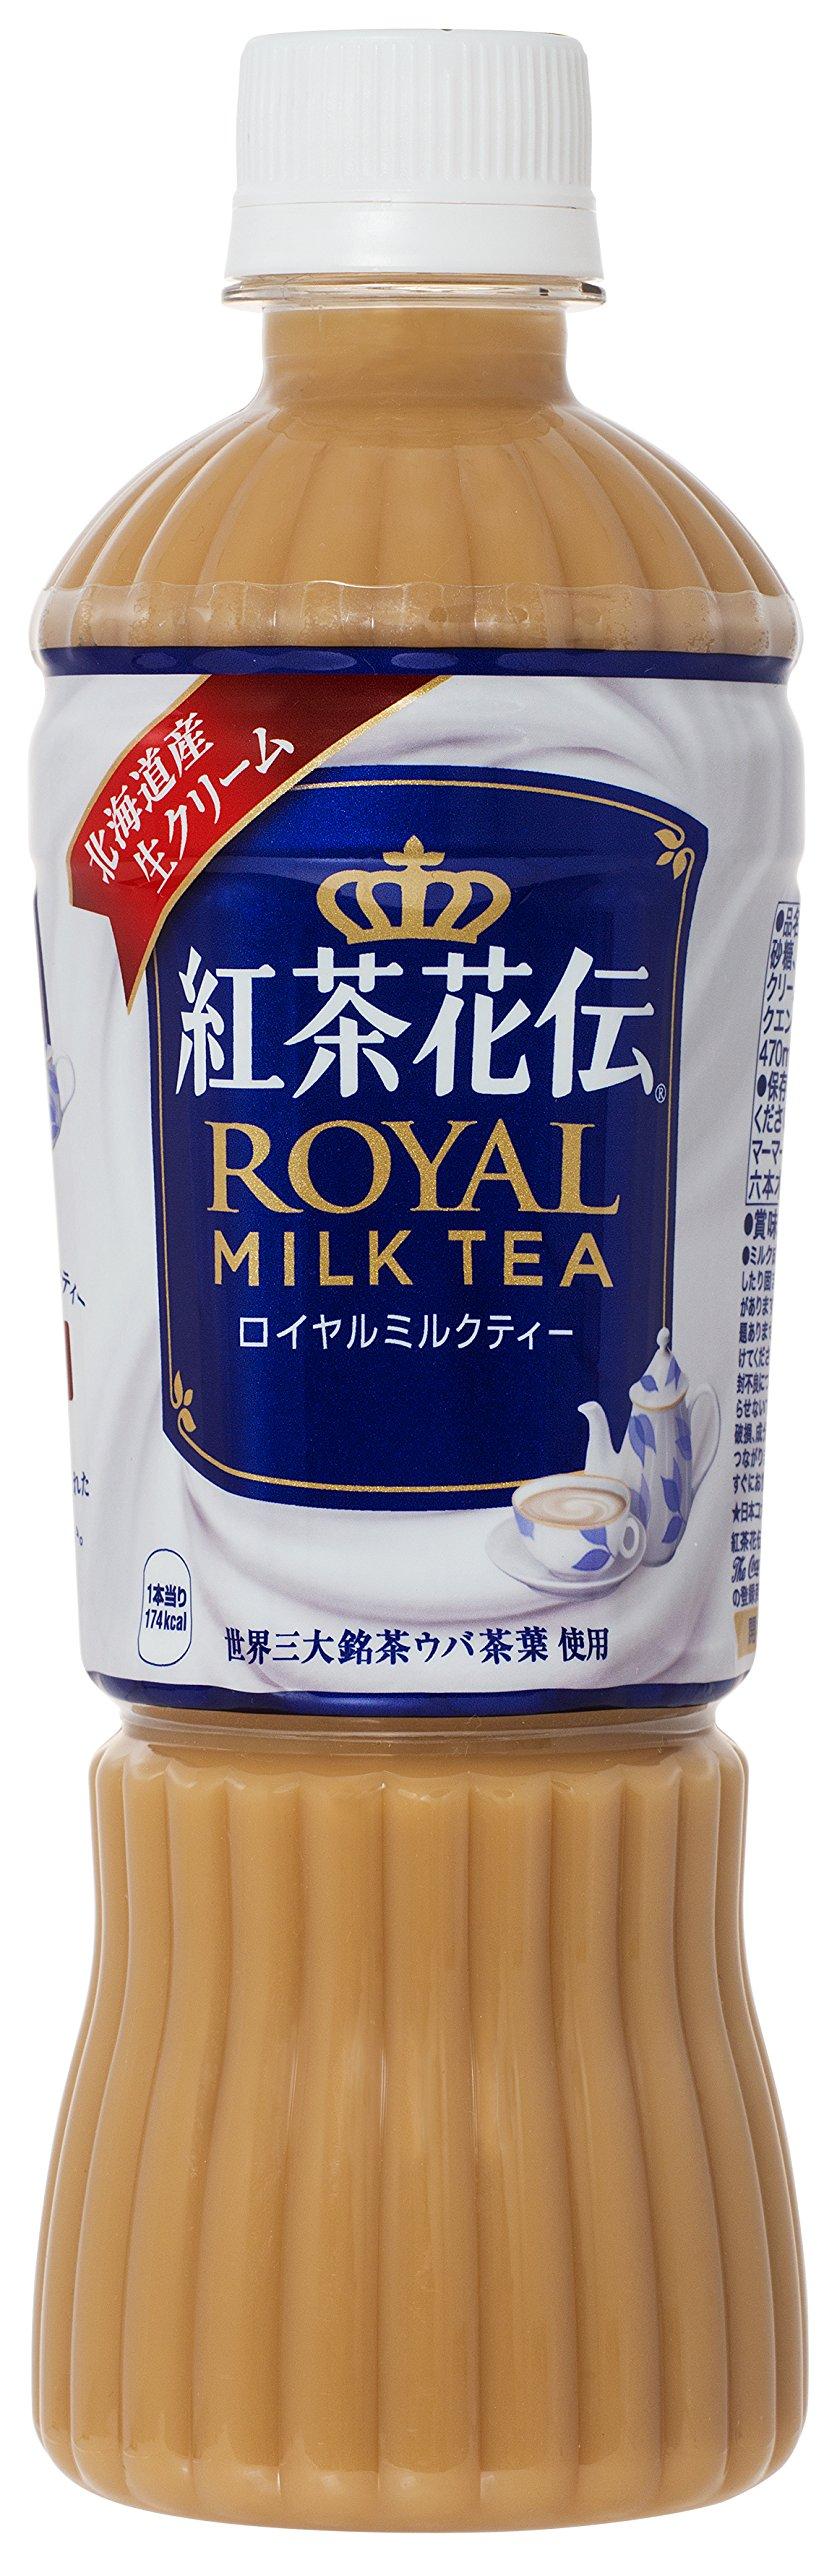 PETX24 this Coca-Cola tea Hanaden Royal milk tea 470ml